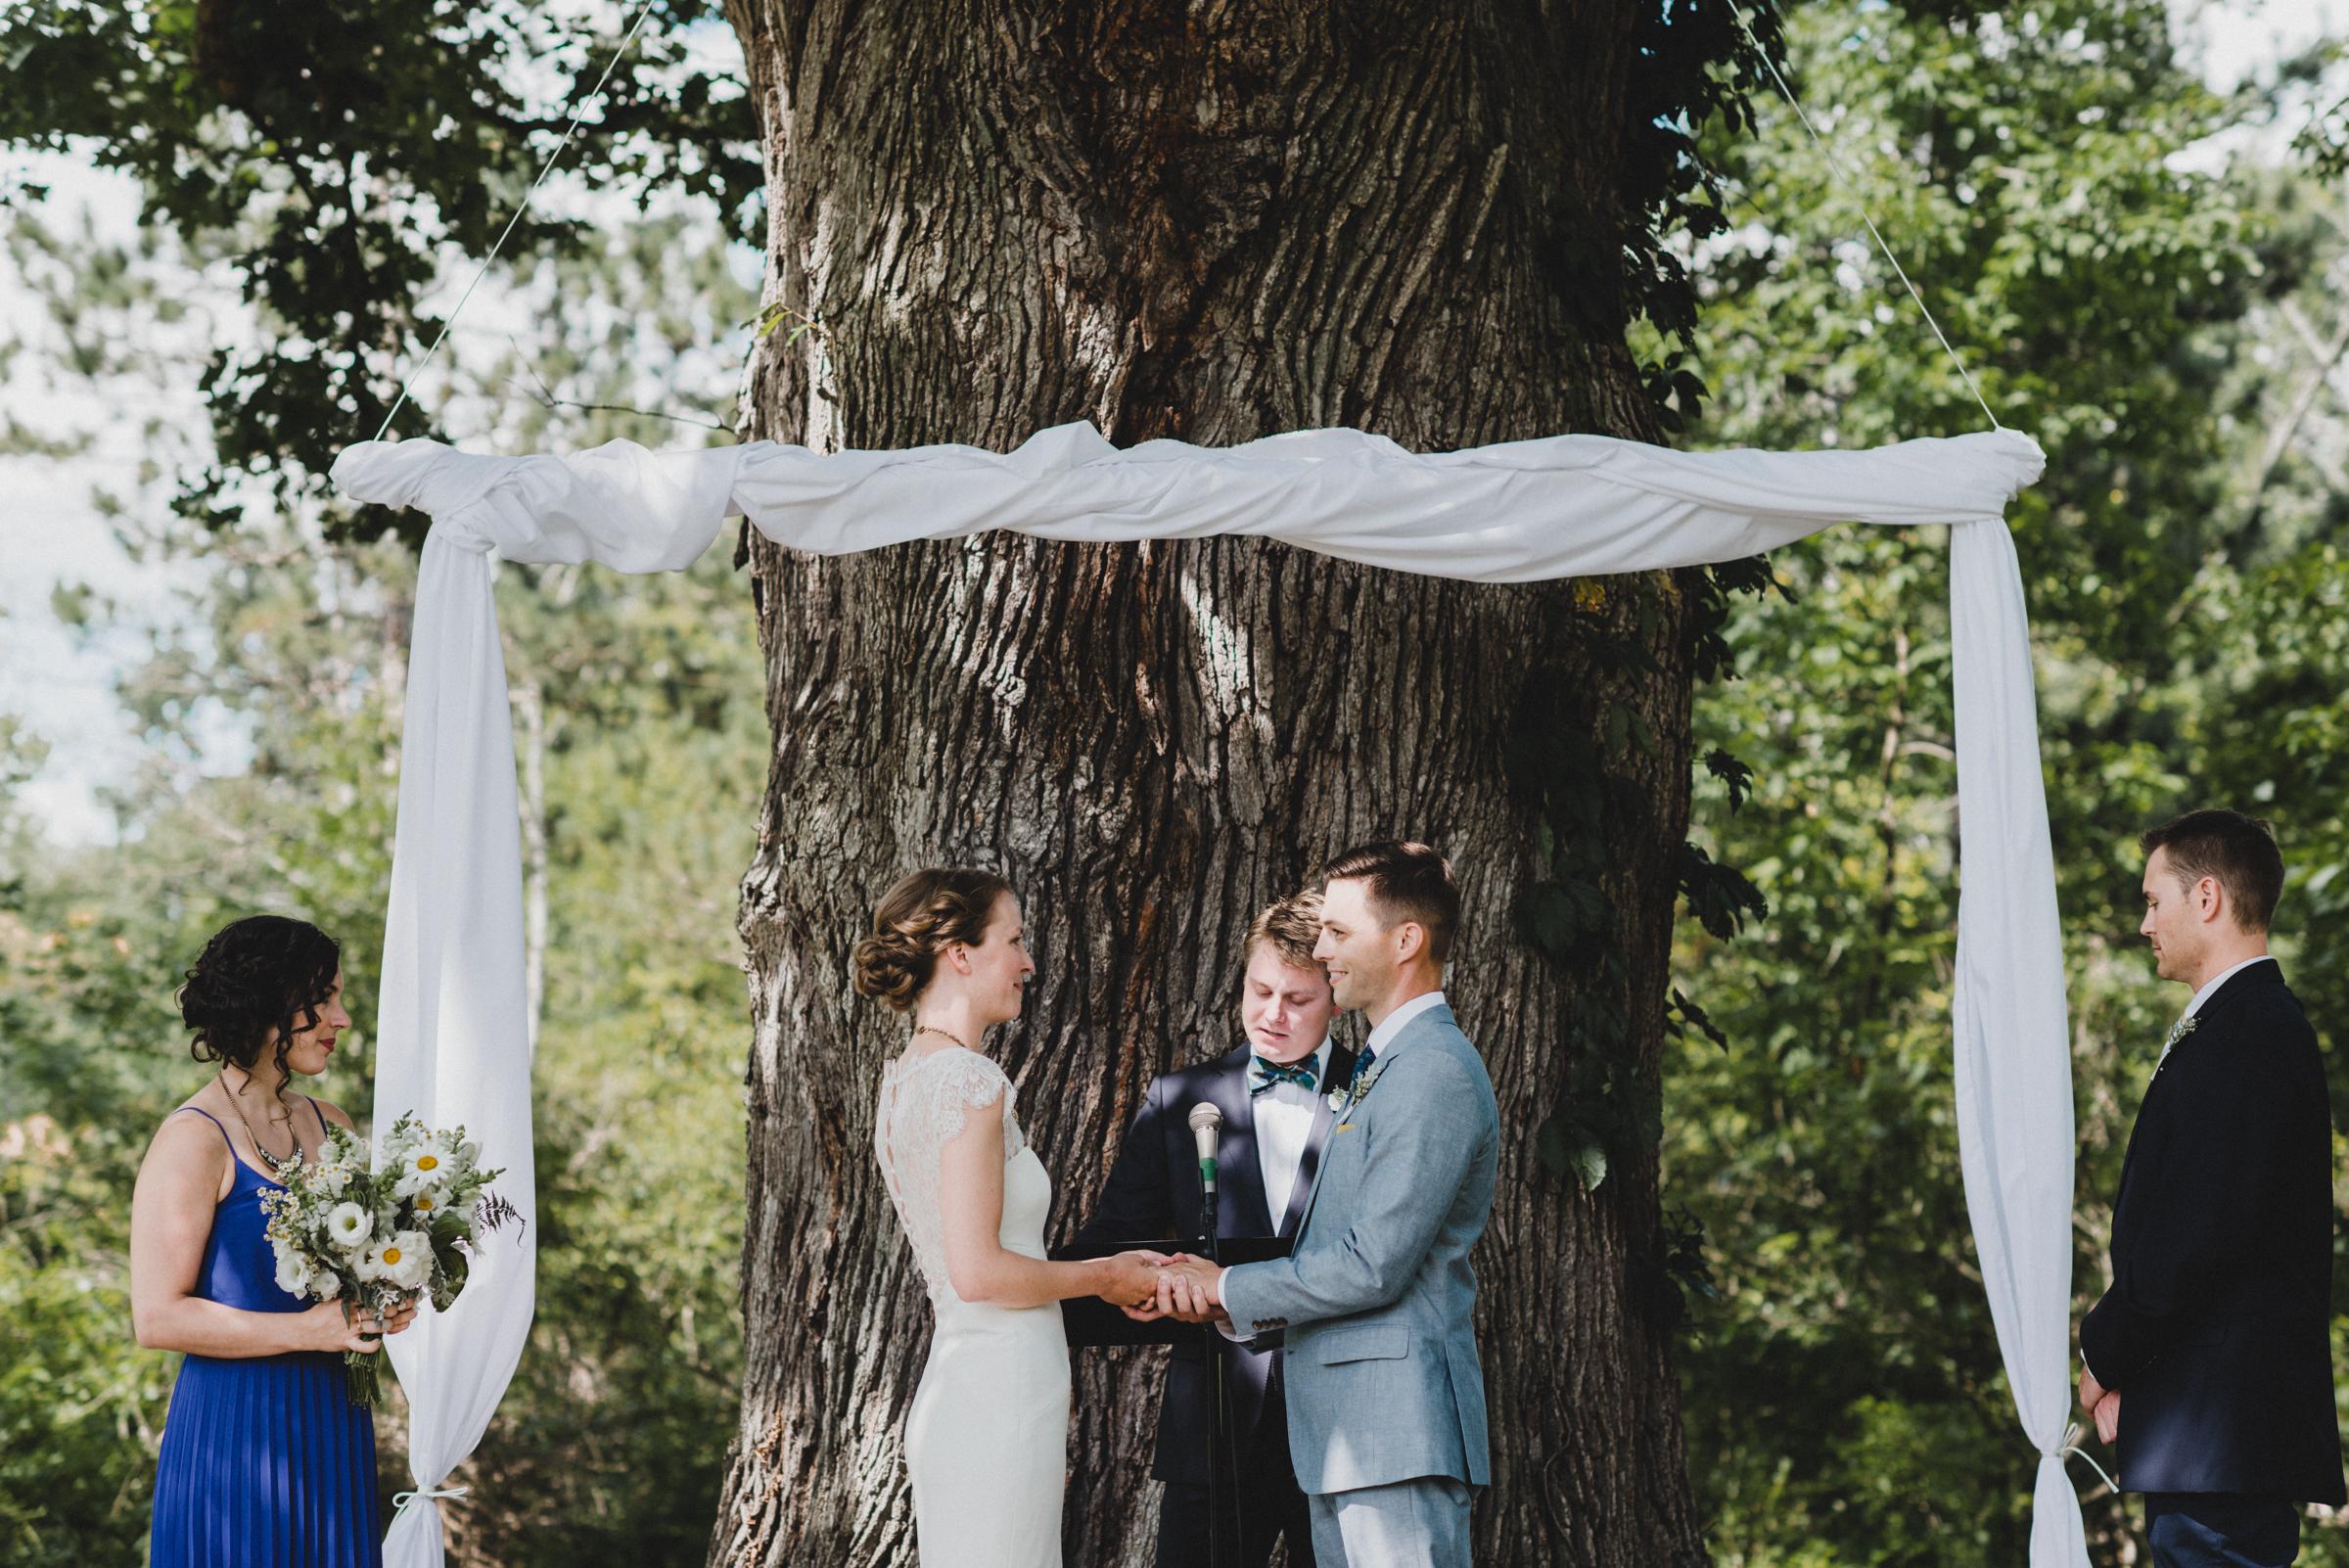 Intimate-Backyard-Farmhouse-Ohio-Wedding-Andi+Ben_Mallory+Justin-Photographers-165.JPG